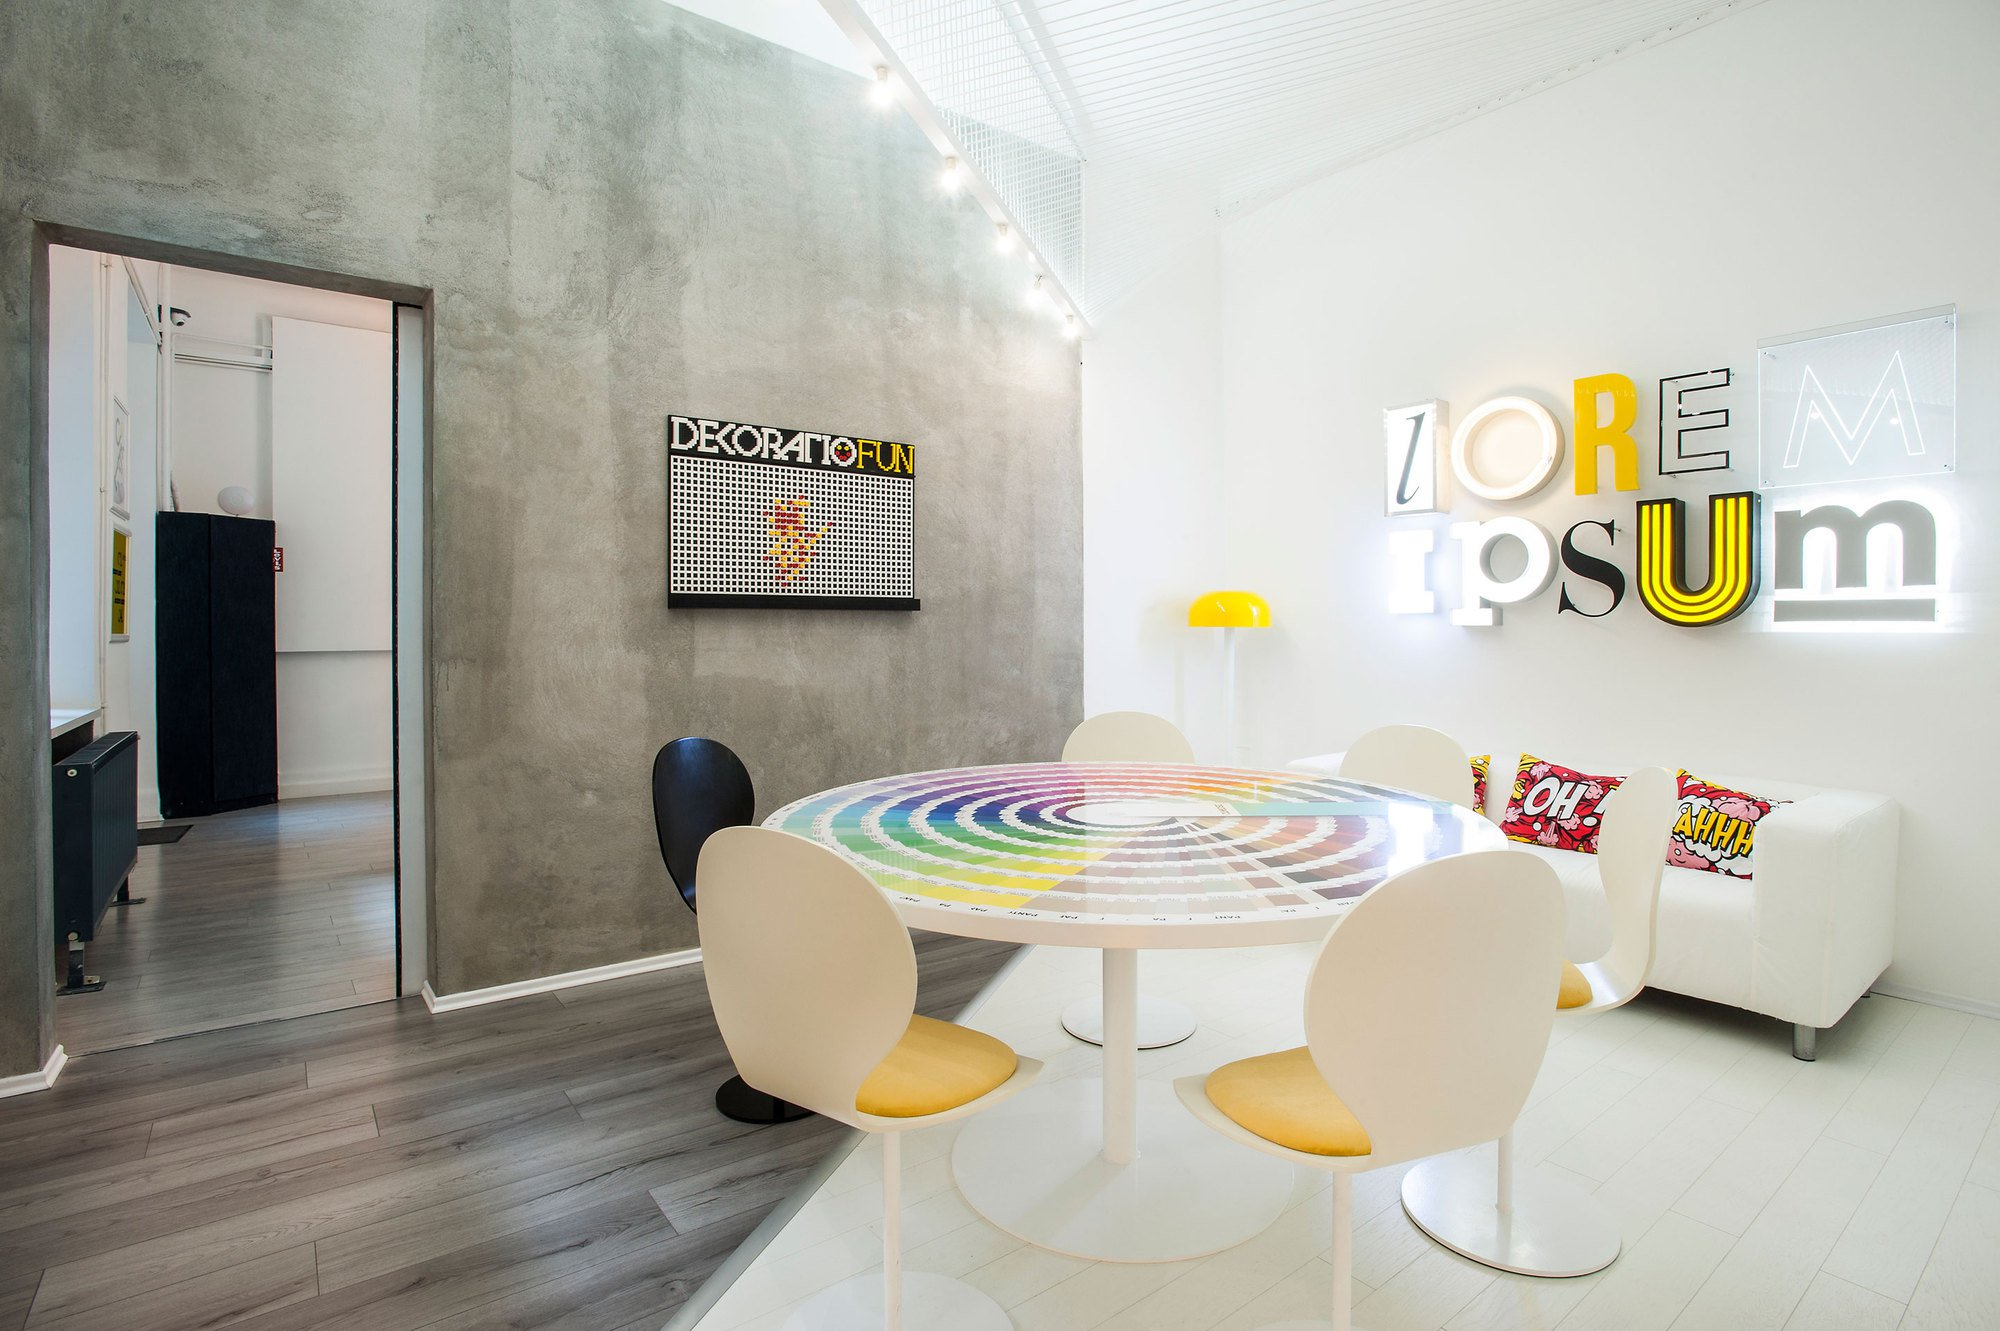 Dekoratio Branding & Design Studio in Budapest - the vandallist (11)